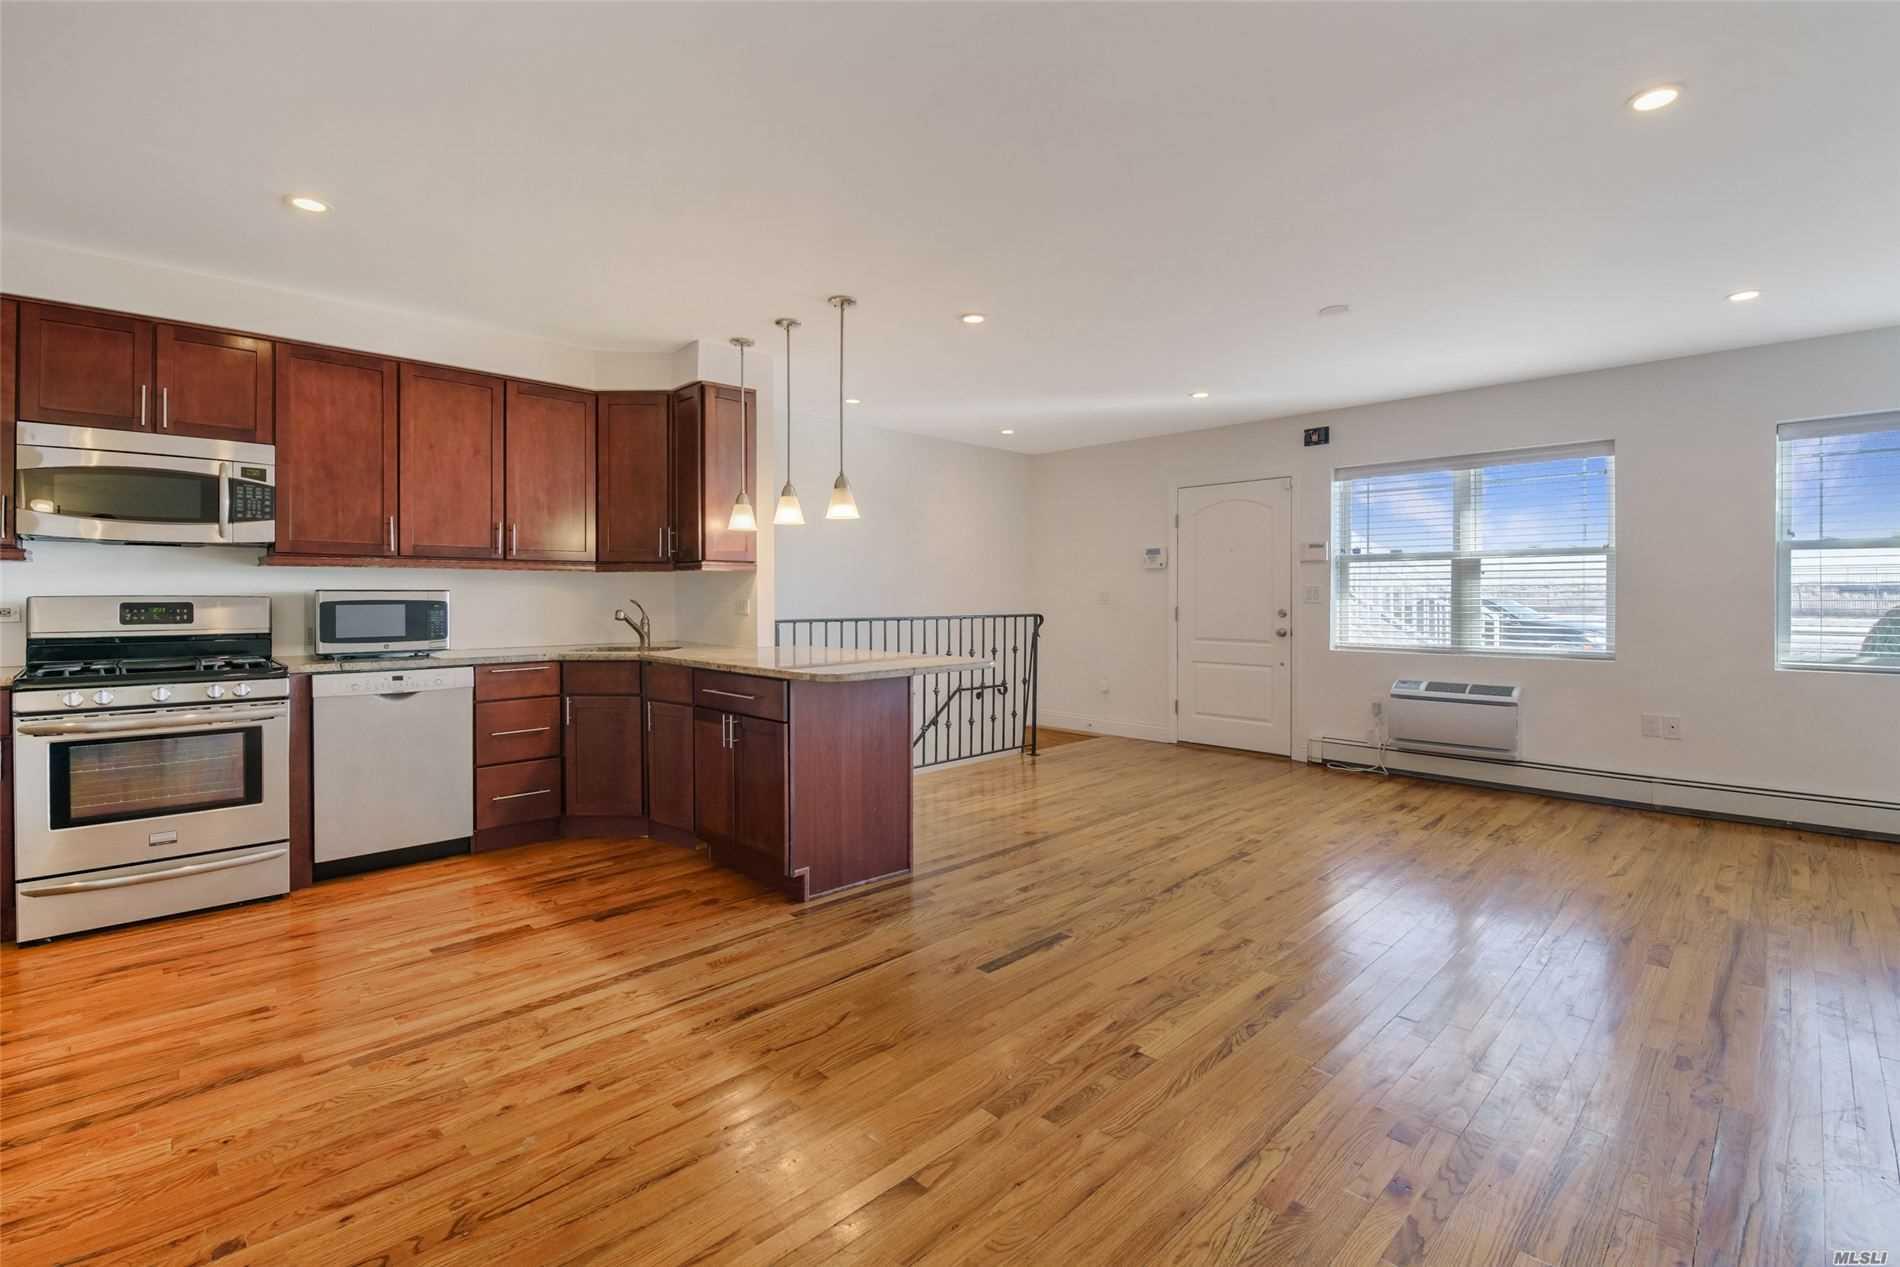 Property for sale at 100-10 Shorefront Parkway # 19A, Rockaway Park NY 11694, Rockaway Park,  New York 11694